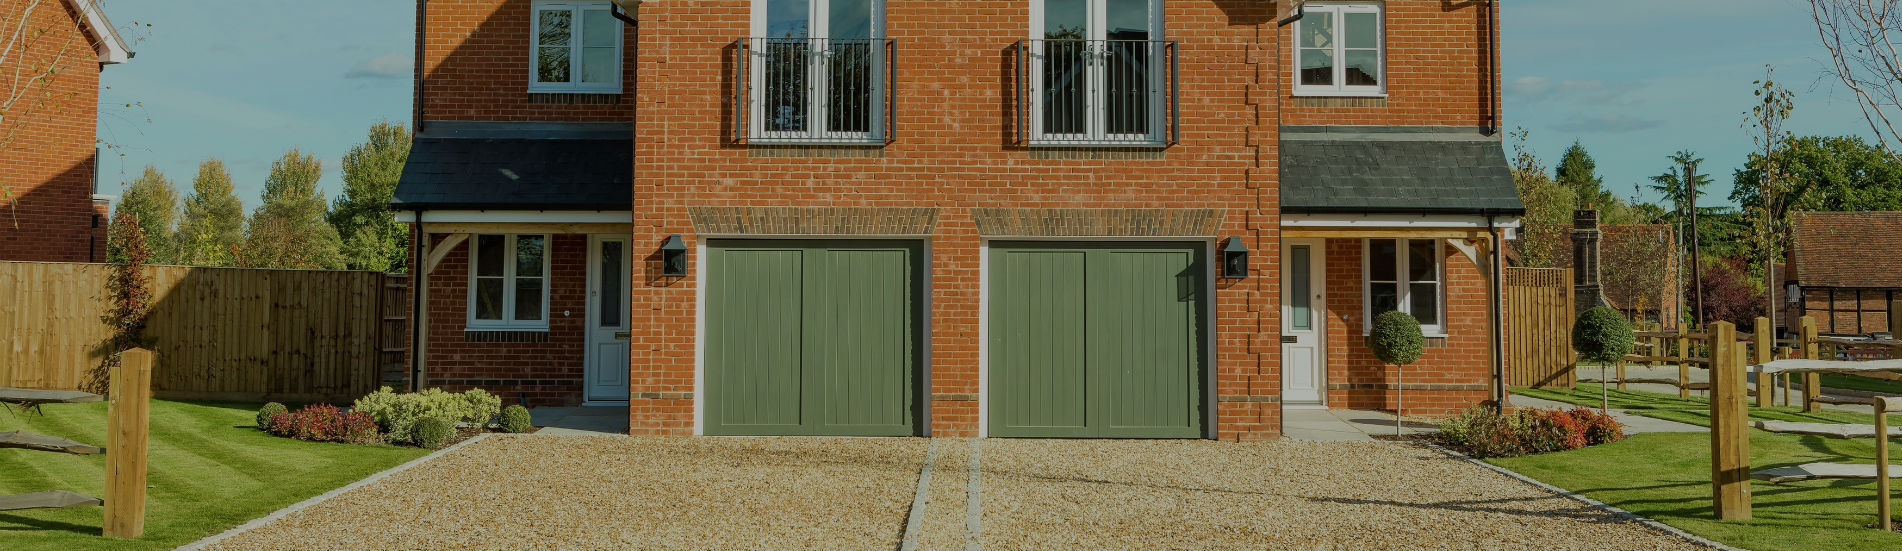 Garage Doors Installation and Suppliers - Millgate Highfield Development